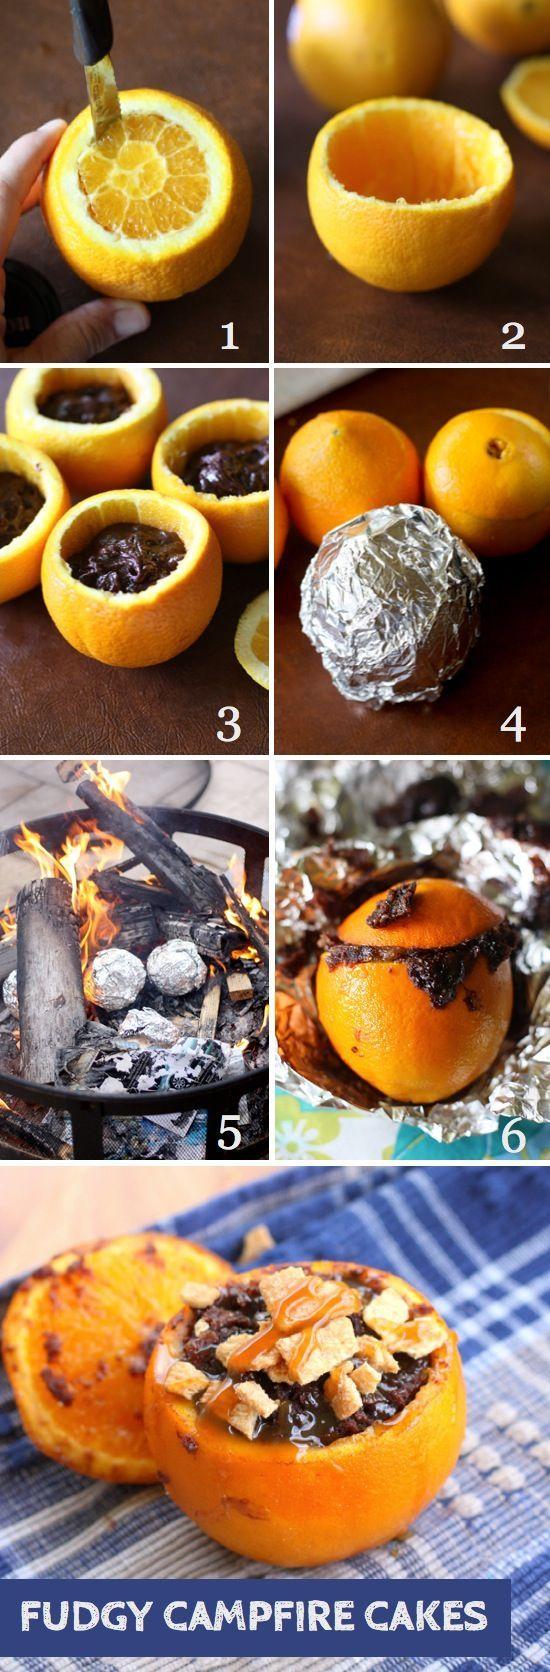 Fudgy Campfire Brownies   Campfire food, Campfire cake ...